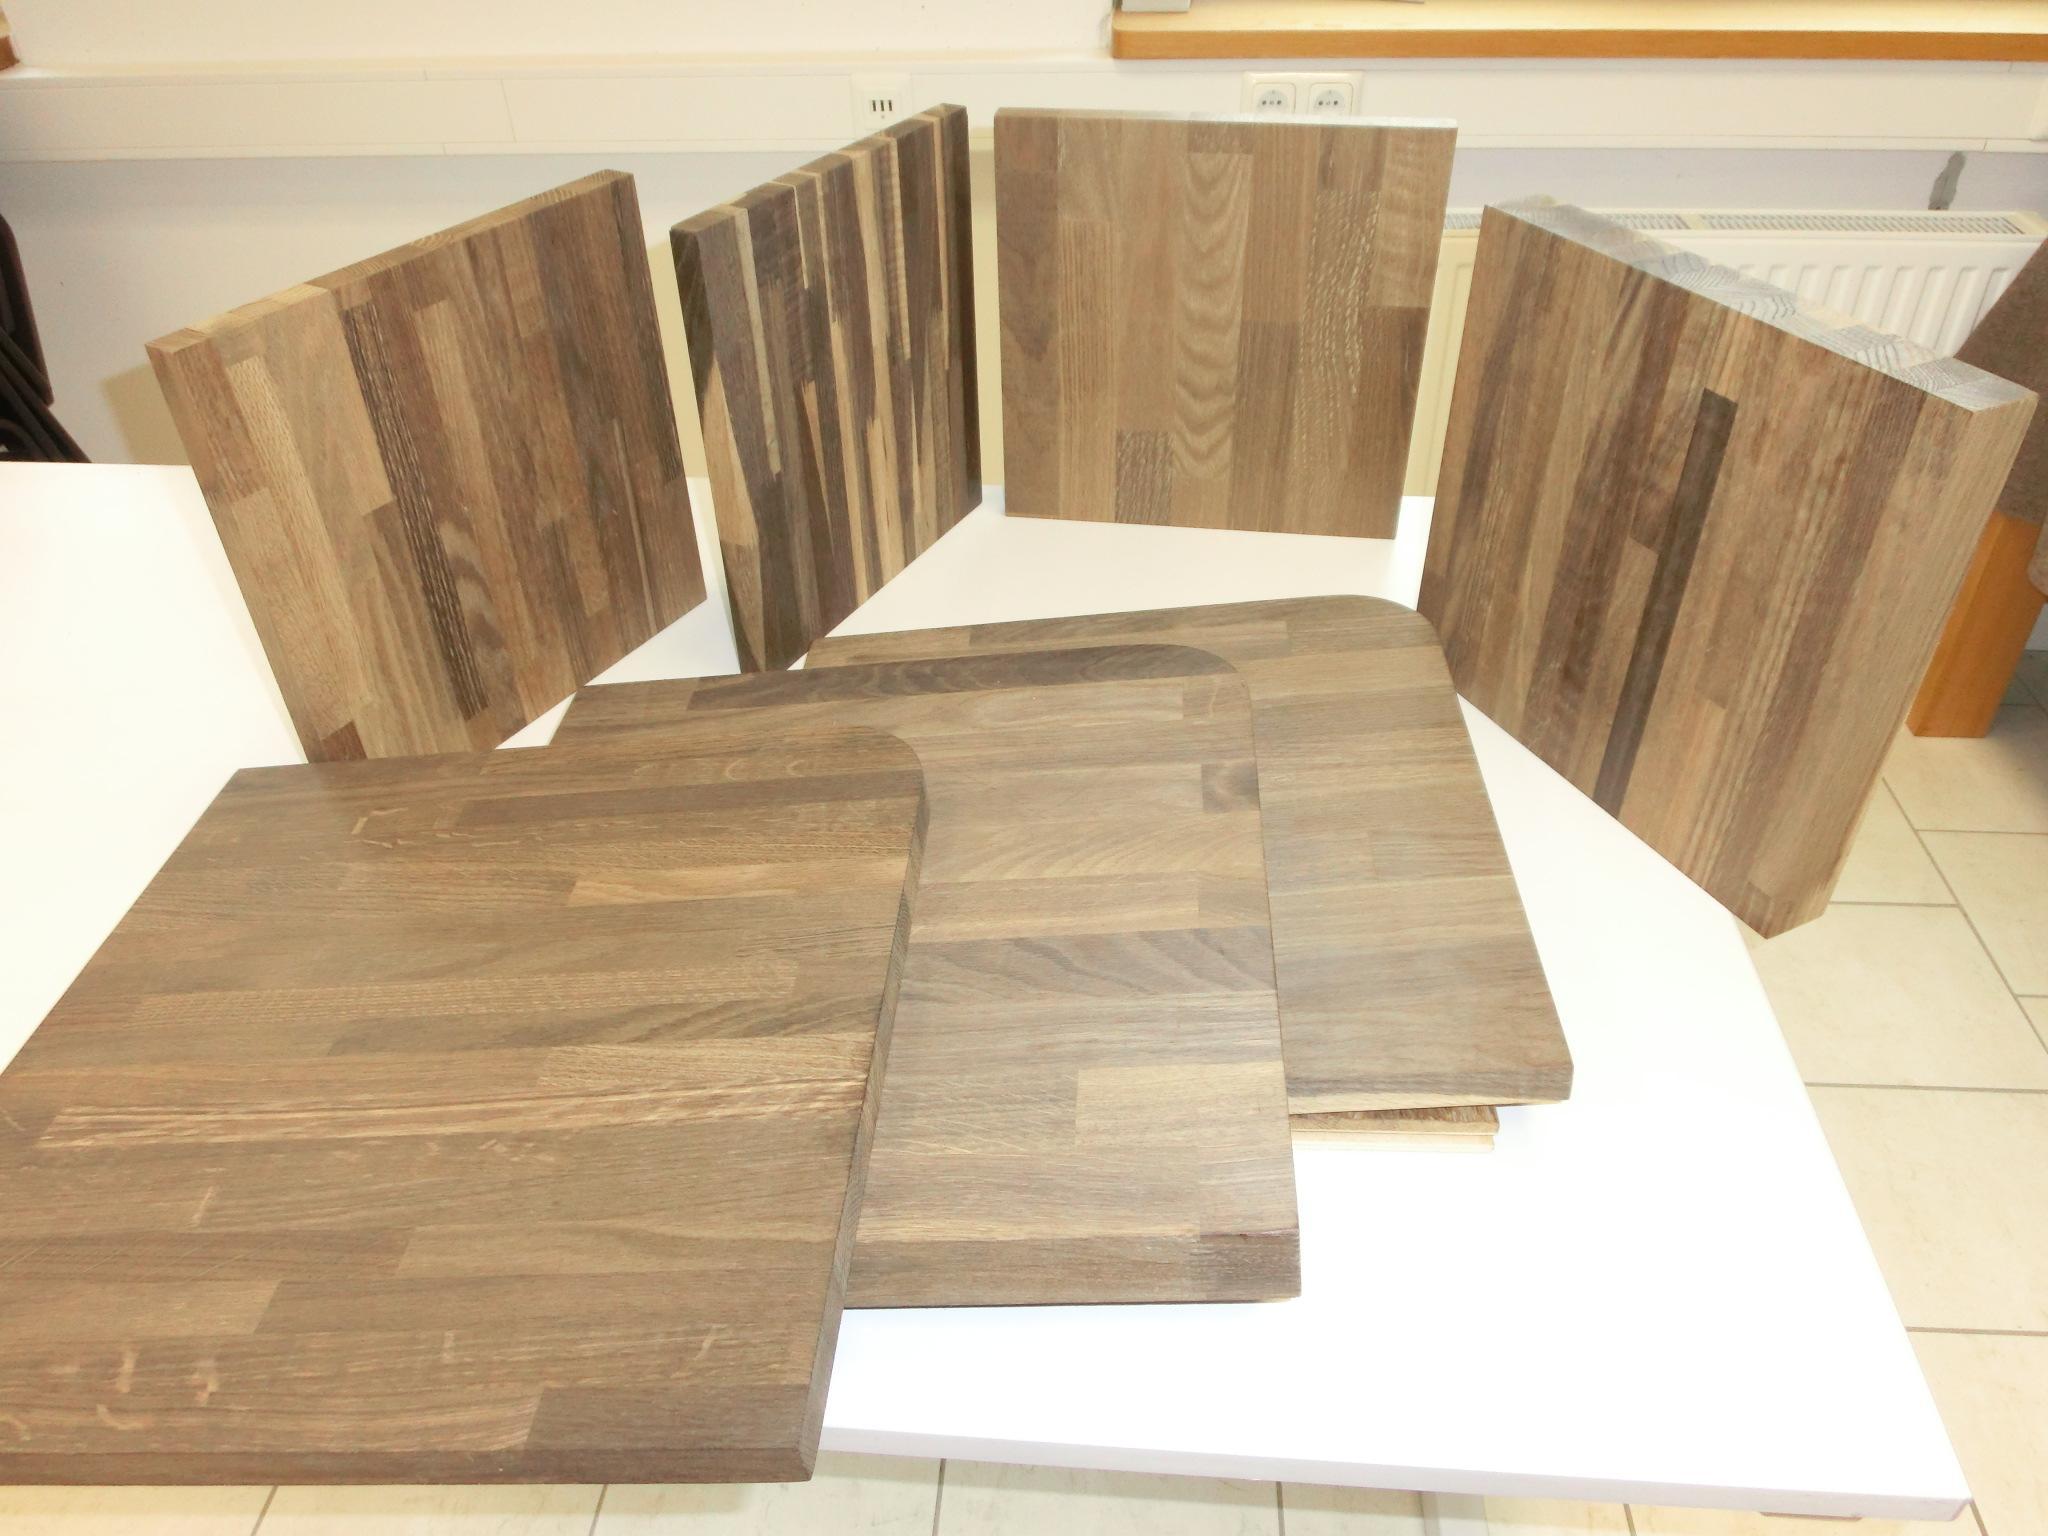 leimholzplatte eiche ger uchert 40 42 mm. Black Bedroom Furniture Sets. Home Design Ideas